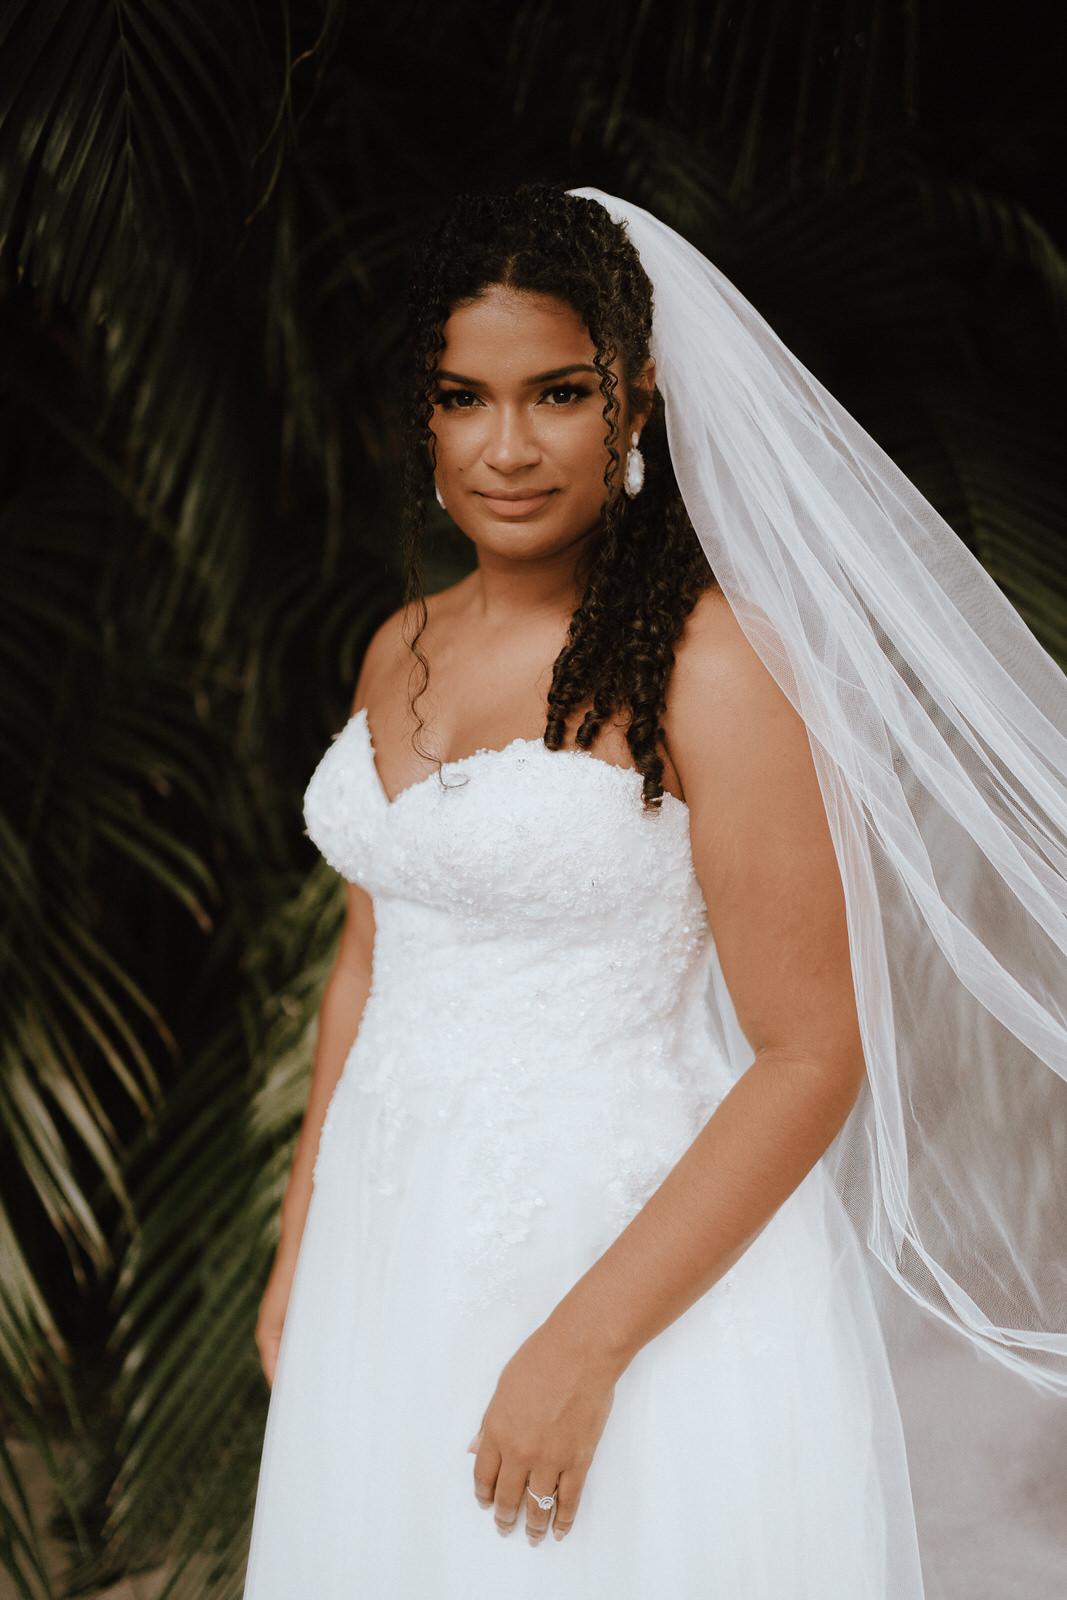 South Seas Island Resort Elopement- Alyana and Shawn- Michelle Gonzalez Photography-142.JPG